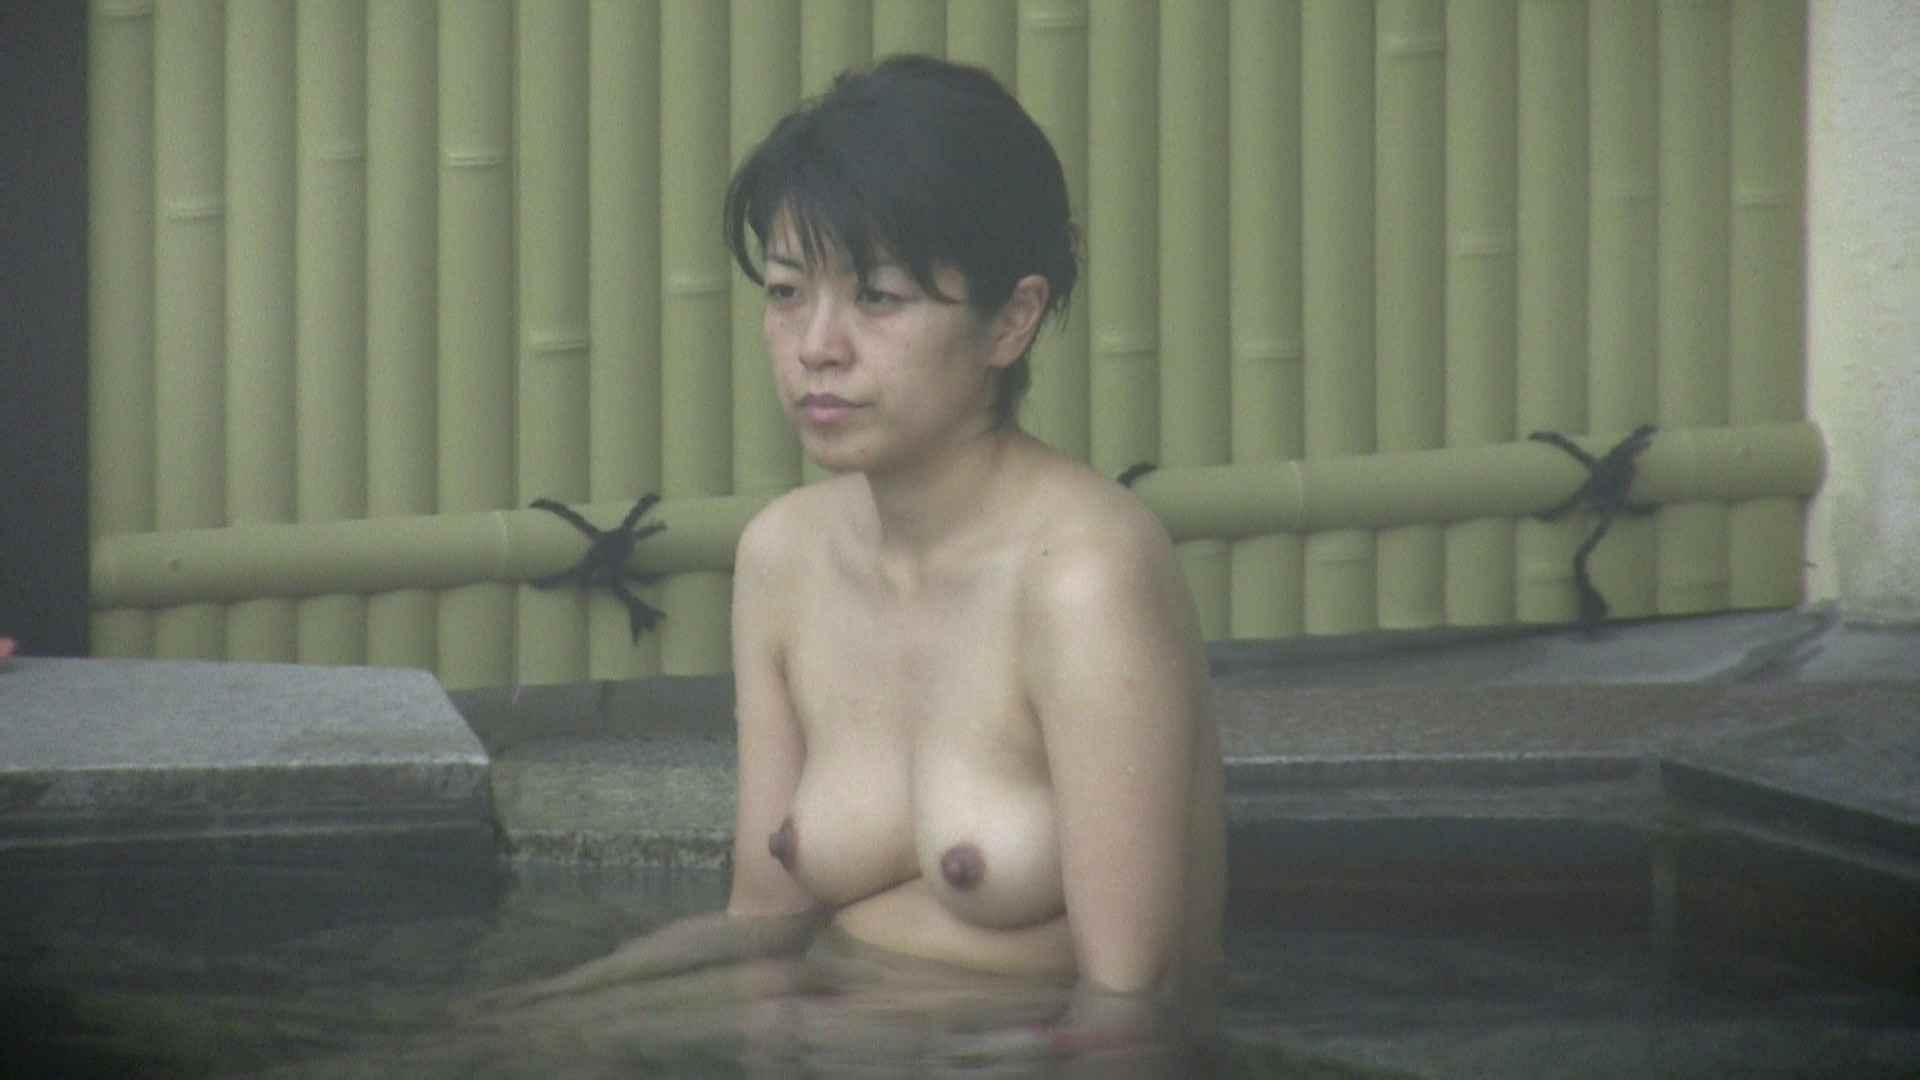 Aquaな露天風呂Vol.585 HなOL | 盗撮  93pic 60